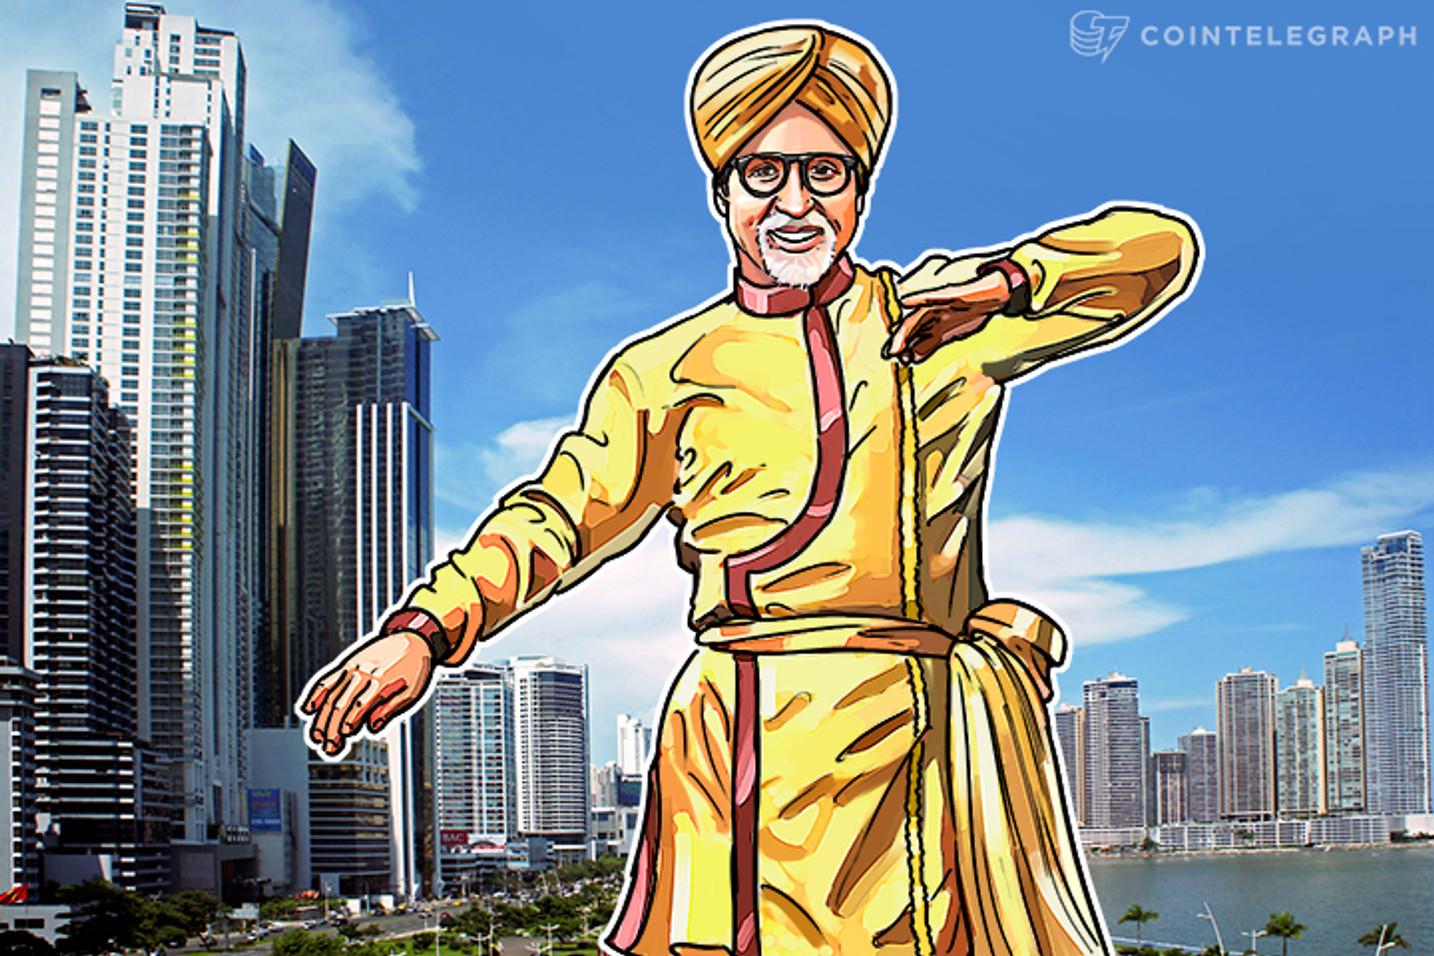 Panama meets Bollywood: Mossack Fonseca, Amitabh Bachchan and Putinophobia